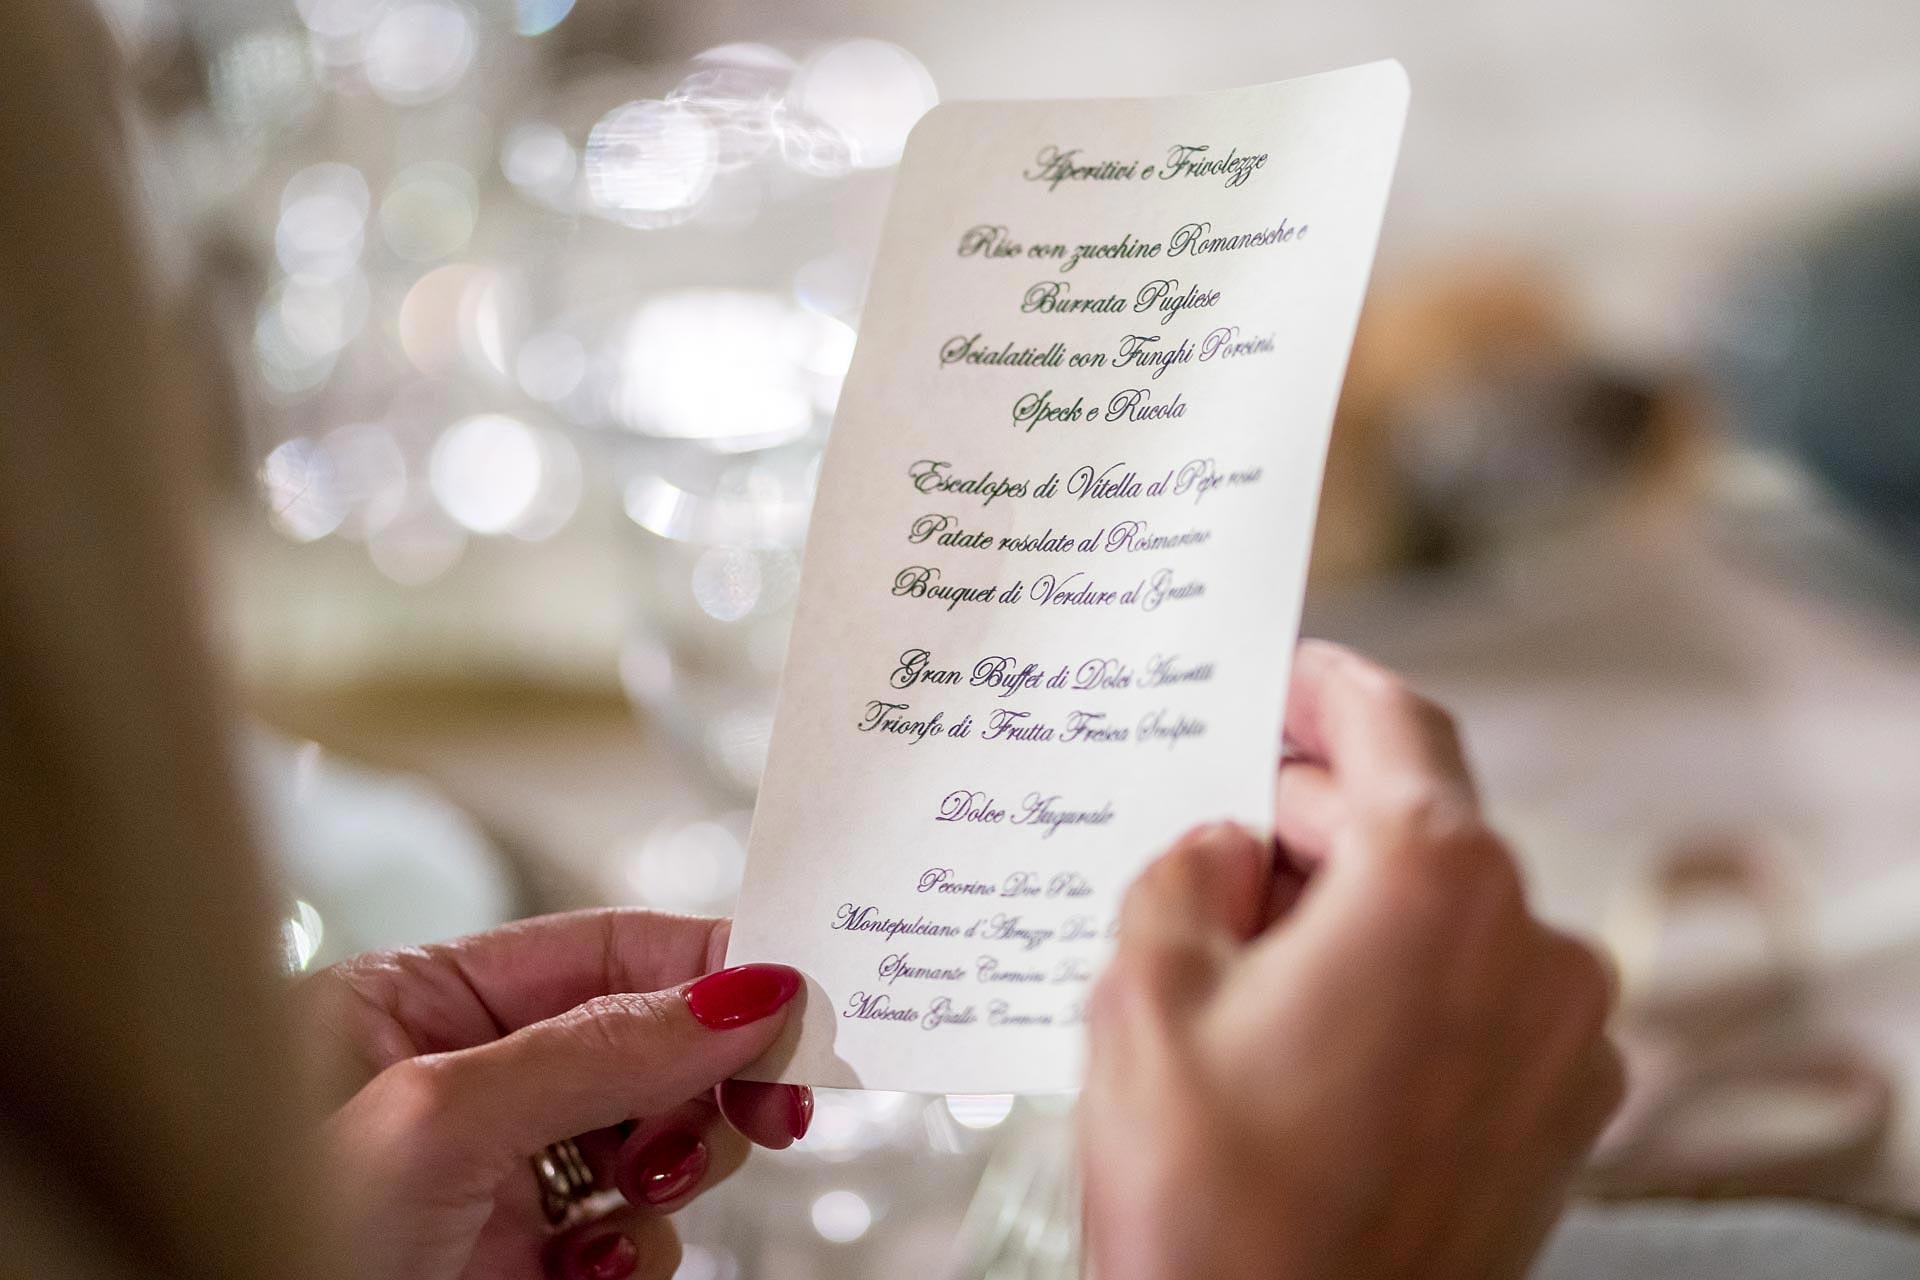 foto-ricevimento-matrimonio-roma-29